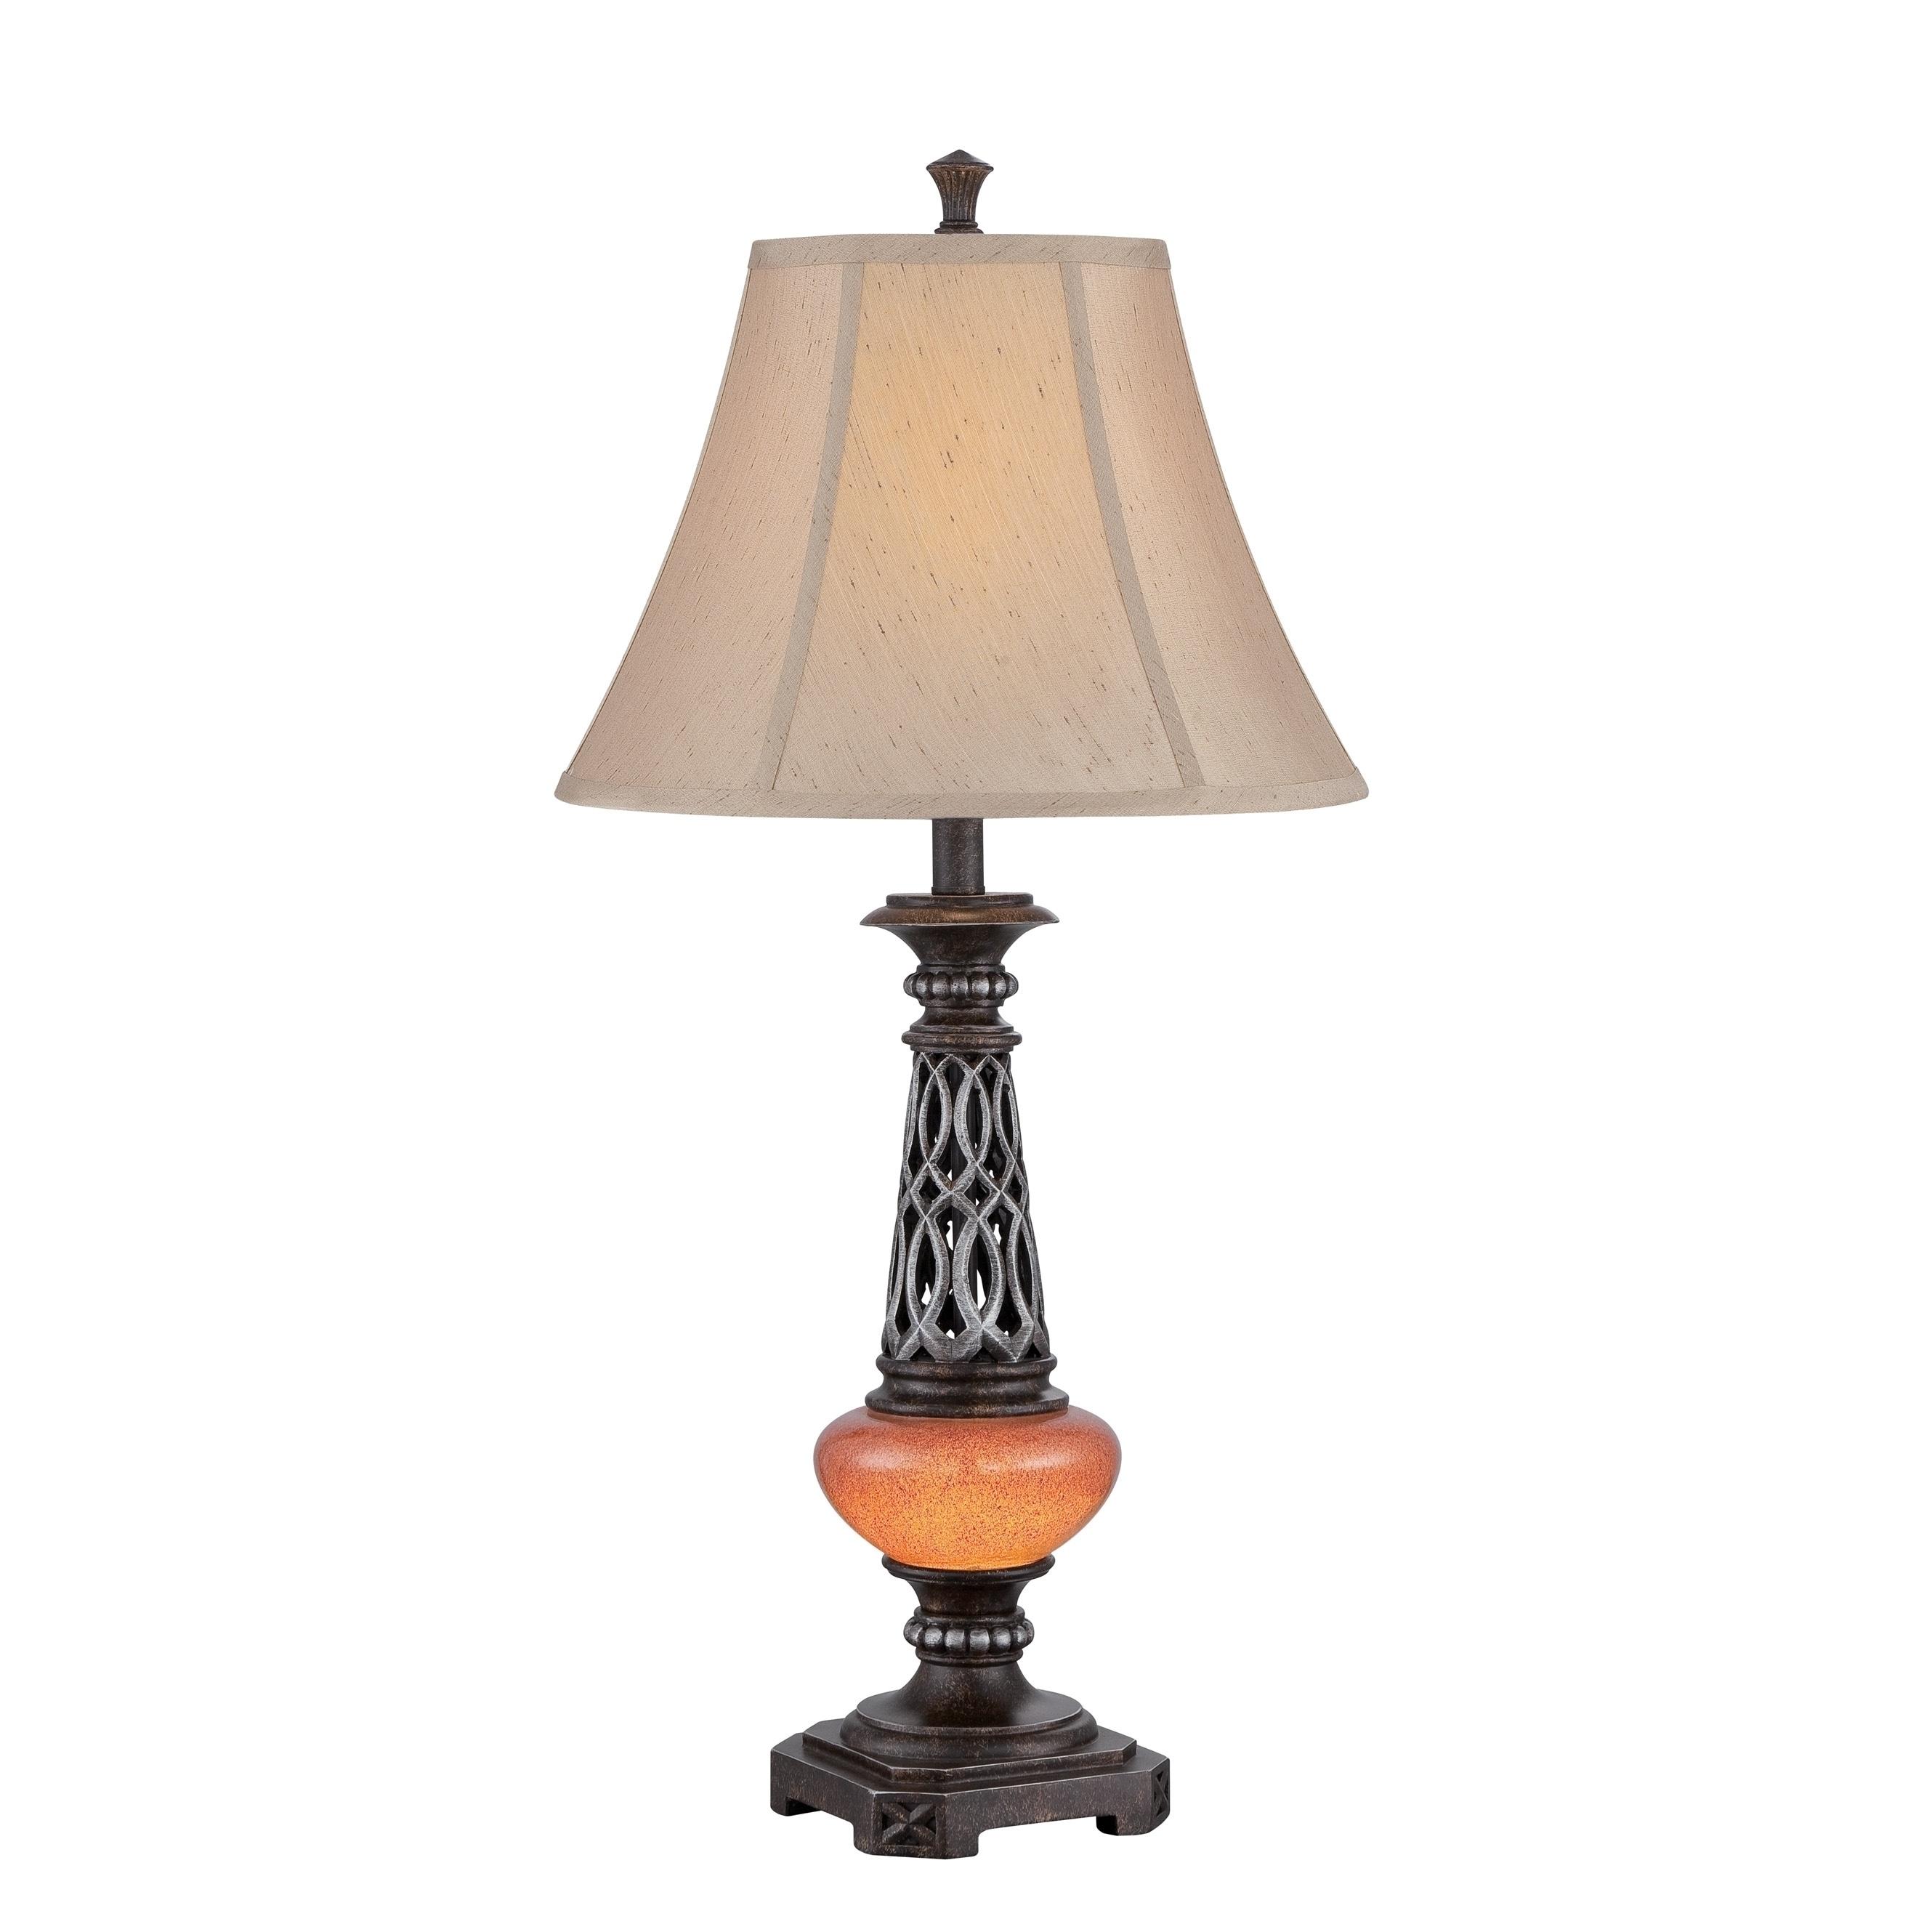 Lite source ellis 2 light table lamp dark bronze with amber and lite source ellis 2 light table lamp dark bronze with amber and beige aloadofball Images